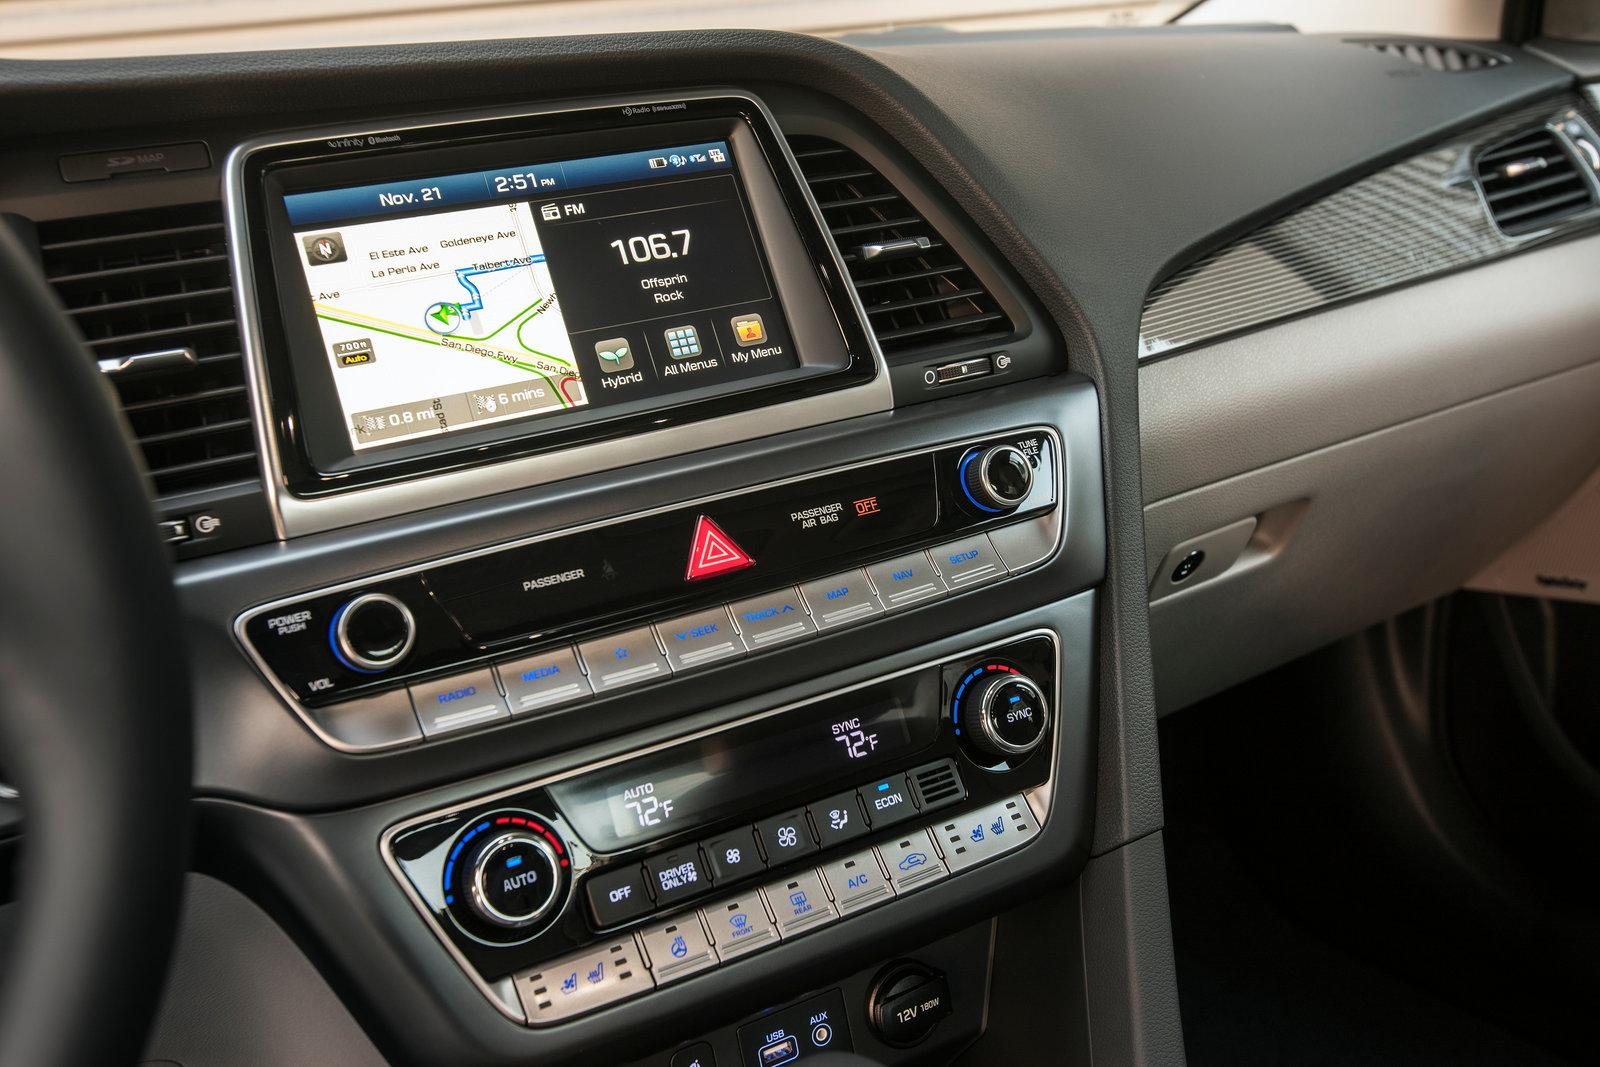 2018 Hyundai Sonata Plug In Hybrid Styles Features Highlights